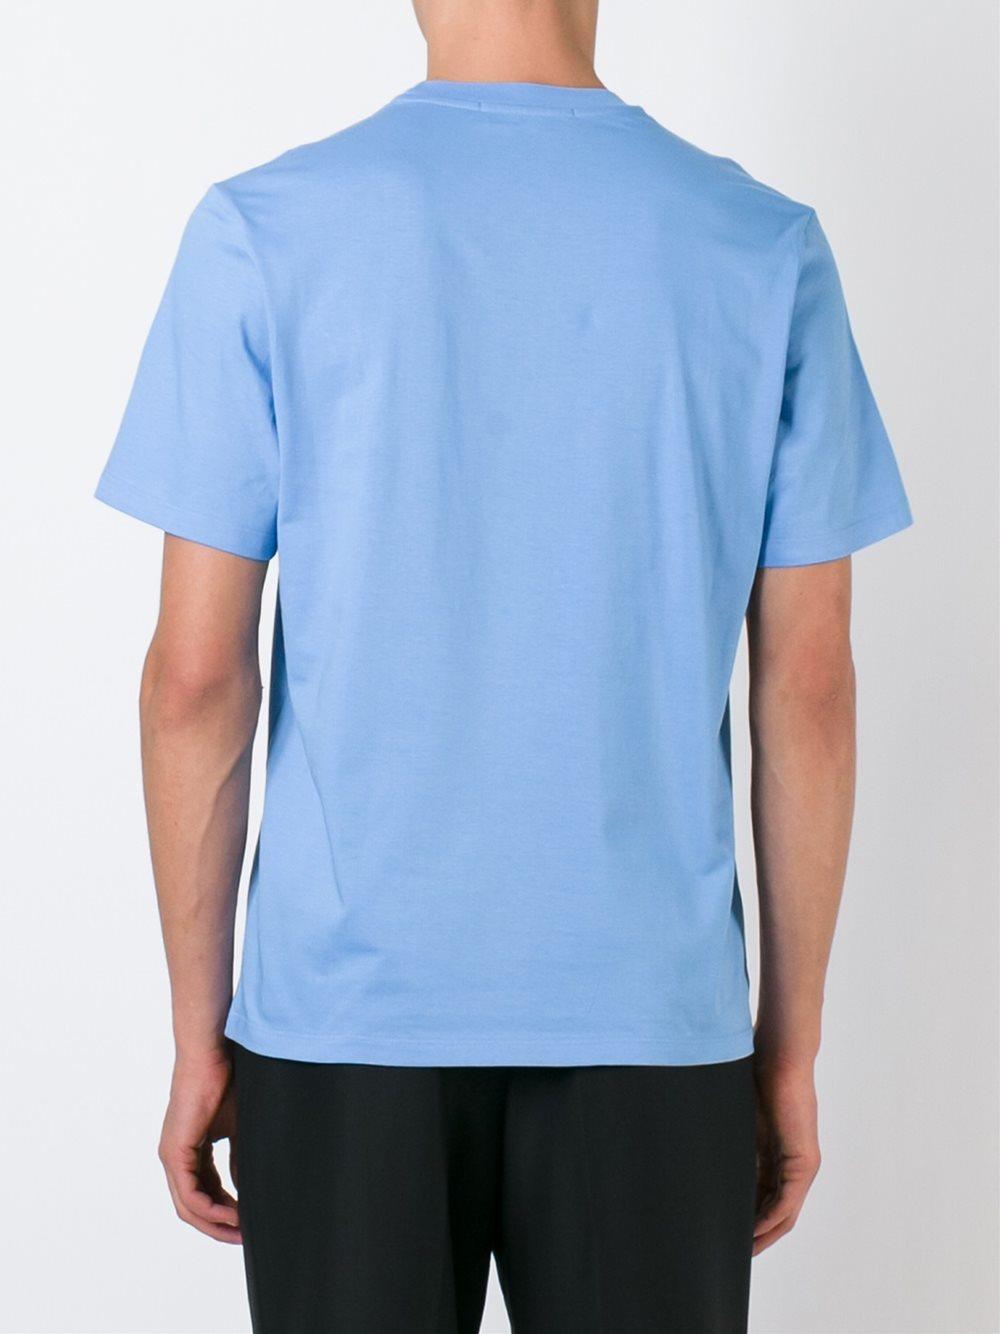 Msgm logo print t shirt in blue for men lyst for Lands end logo shirts